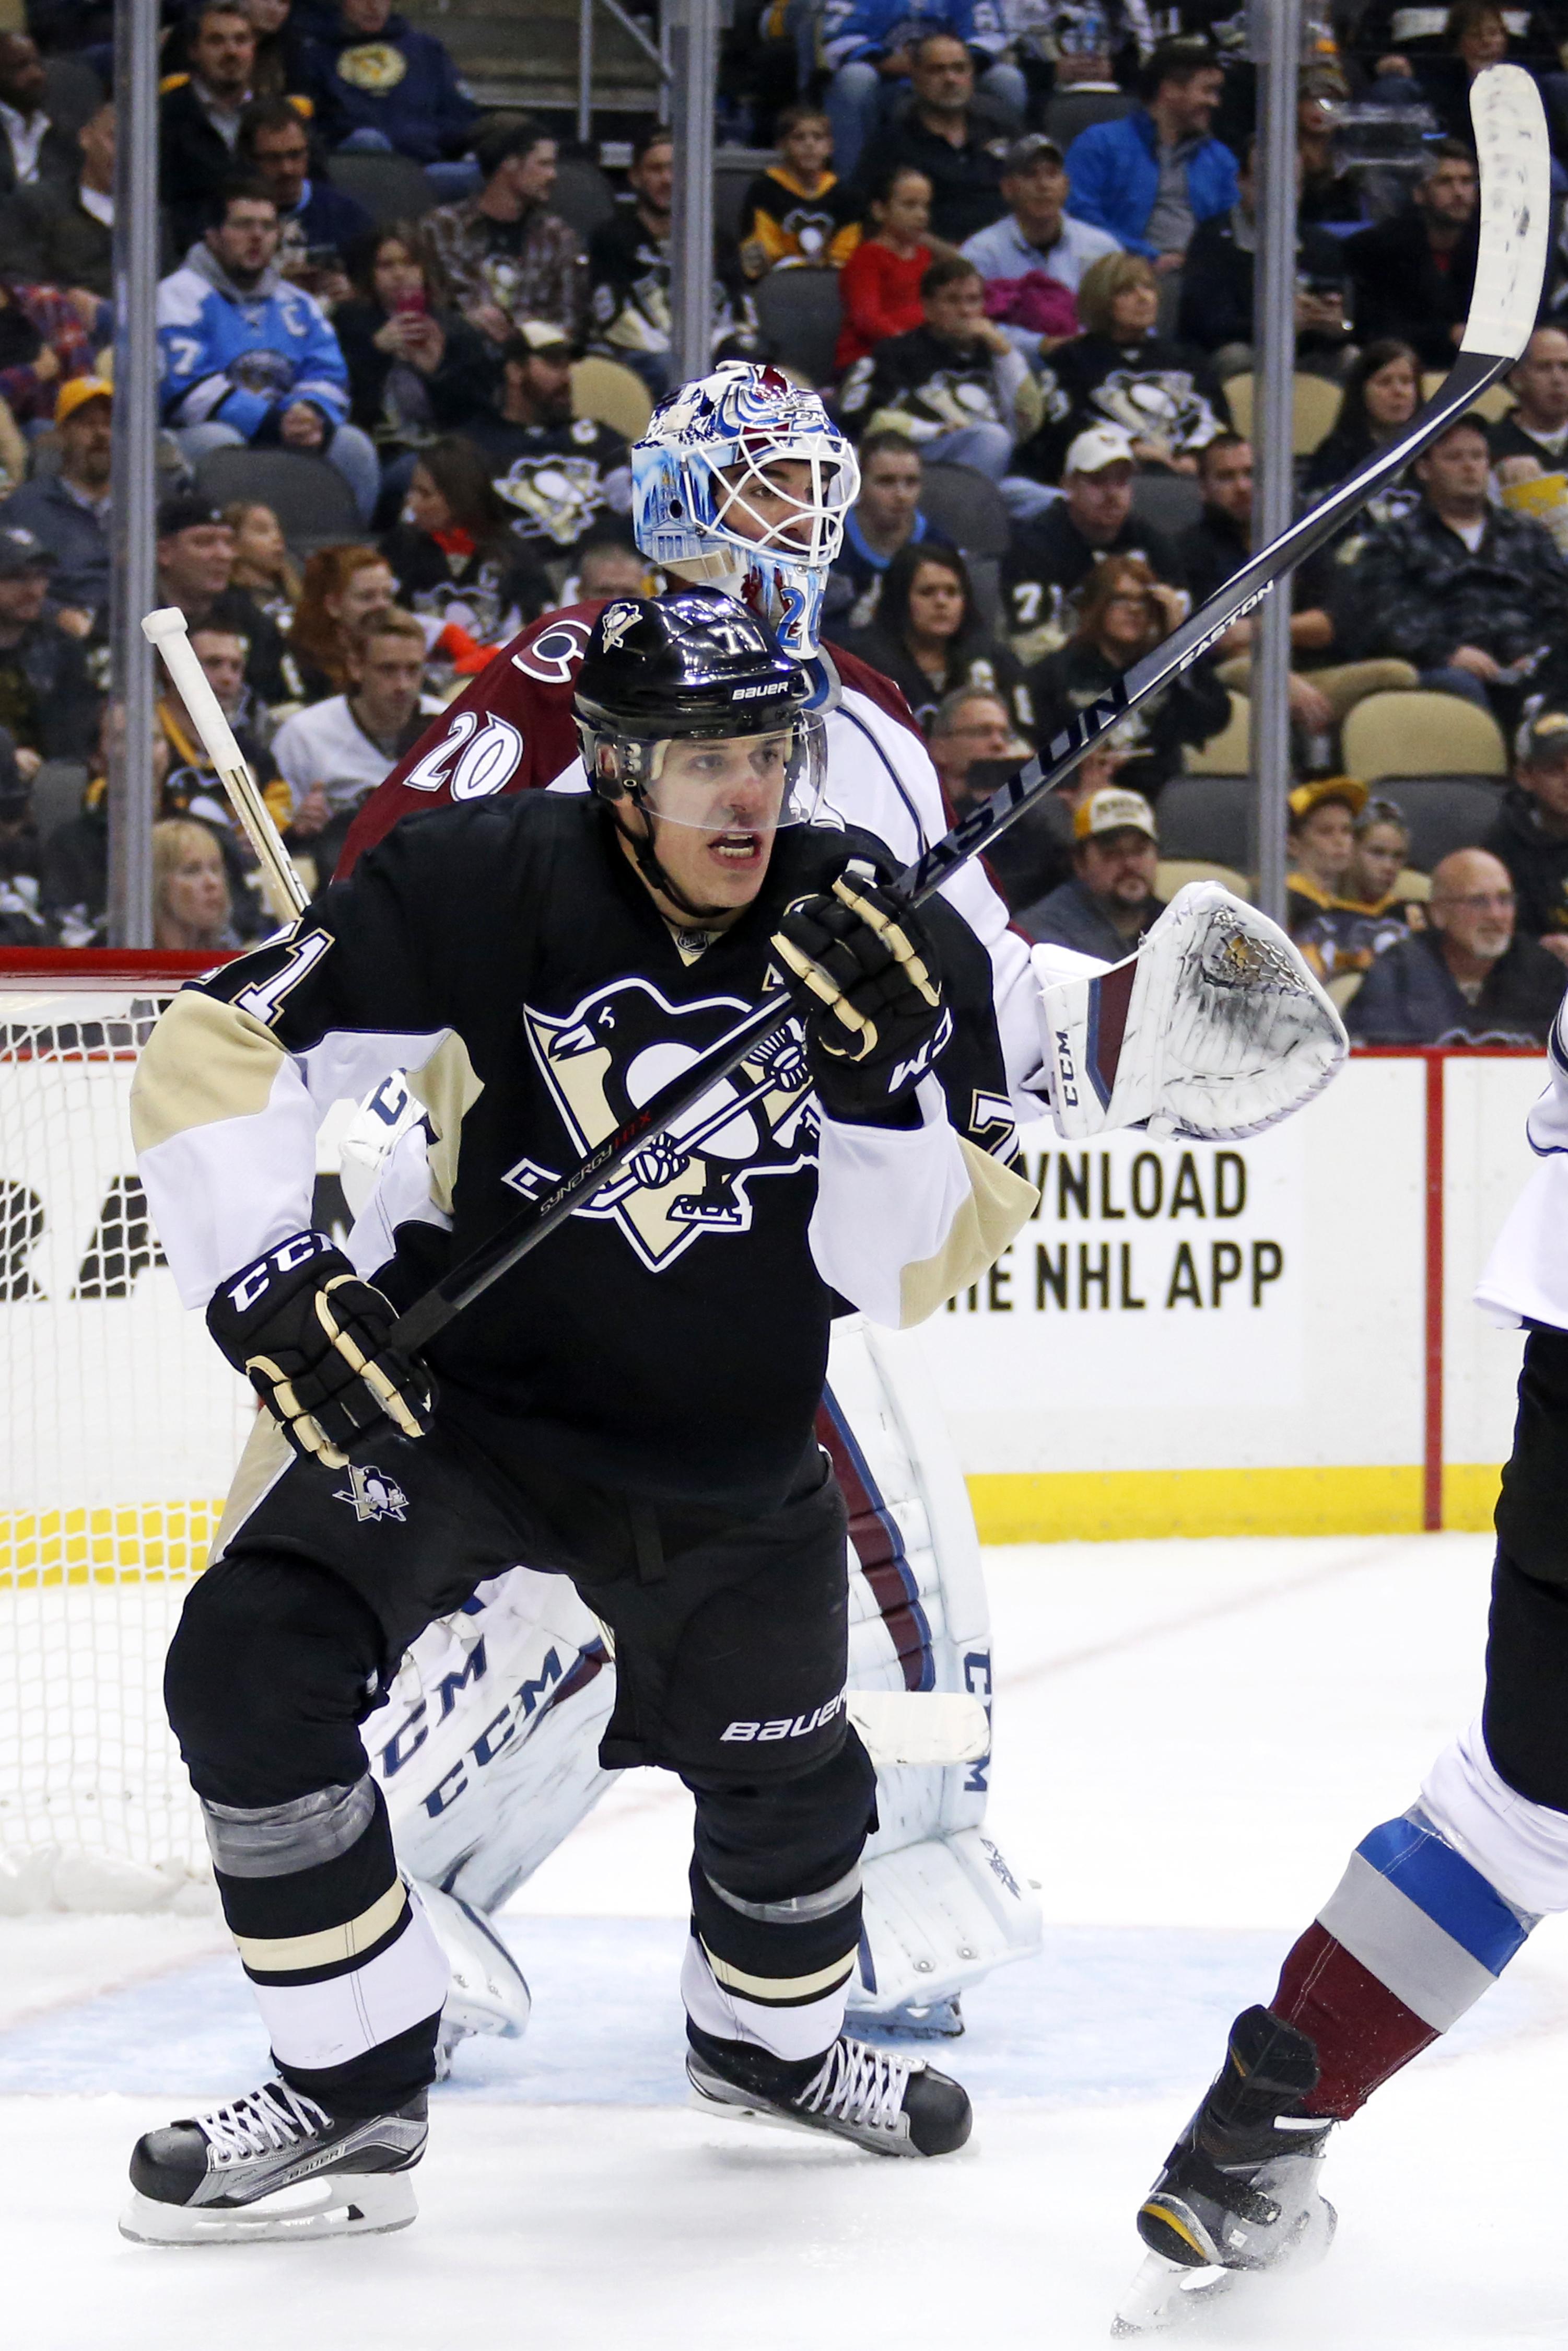 Pittsburgh Penguins' Evgeni Malkin (71) screens Colorado Avalanche goalie Reto Berra (20) during the second period of an NHL hockey game in Pittsburgh Thursday, Nov. 19, 2015. (AP Photo/Gene J. Puskar)